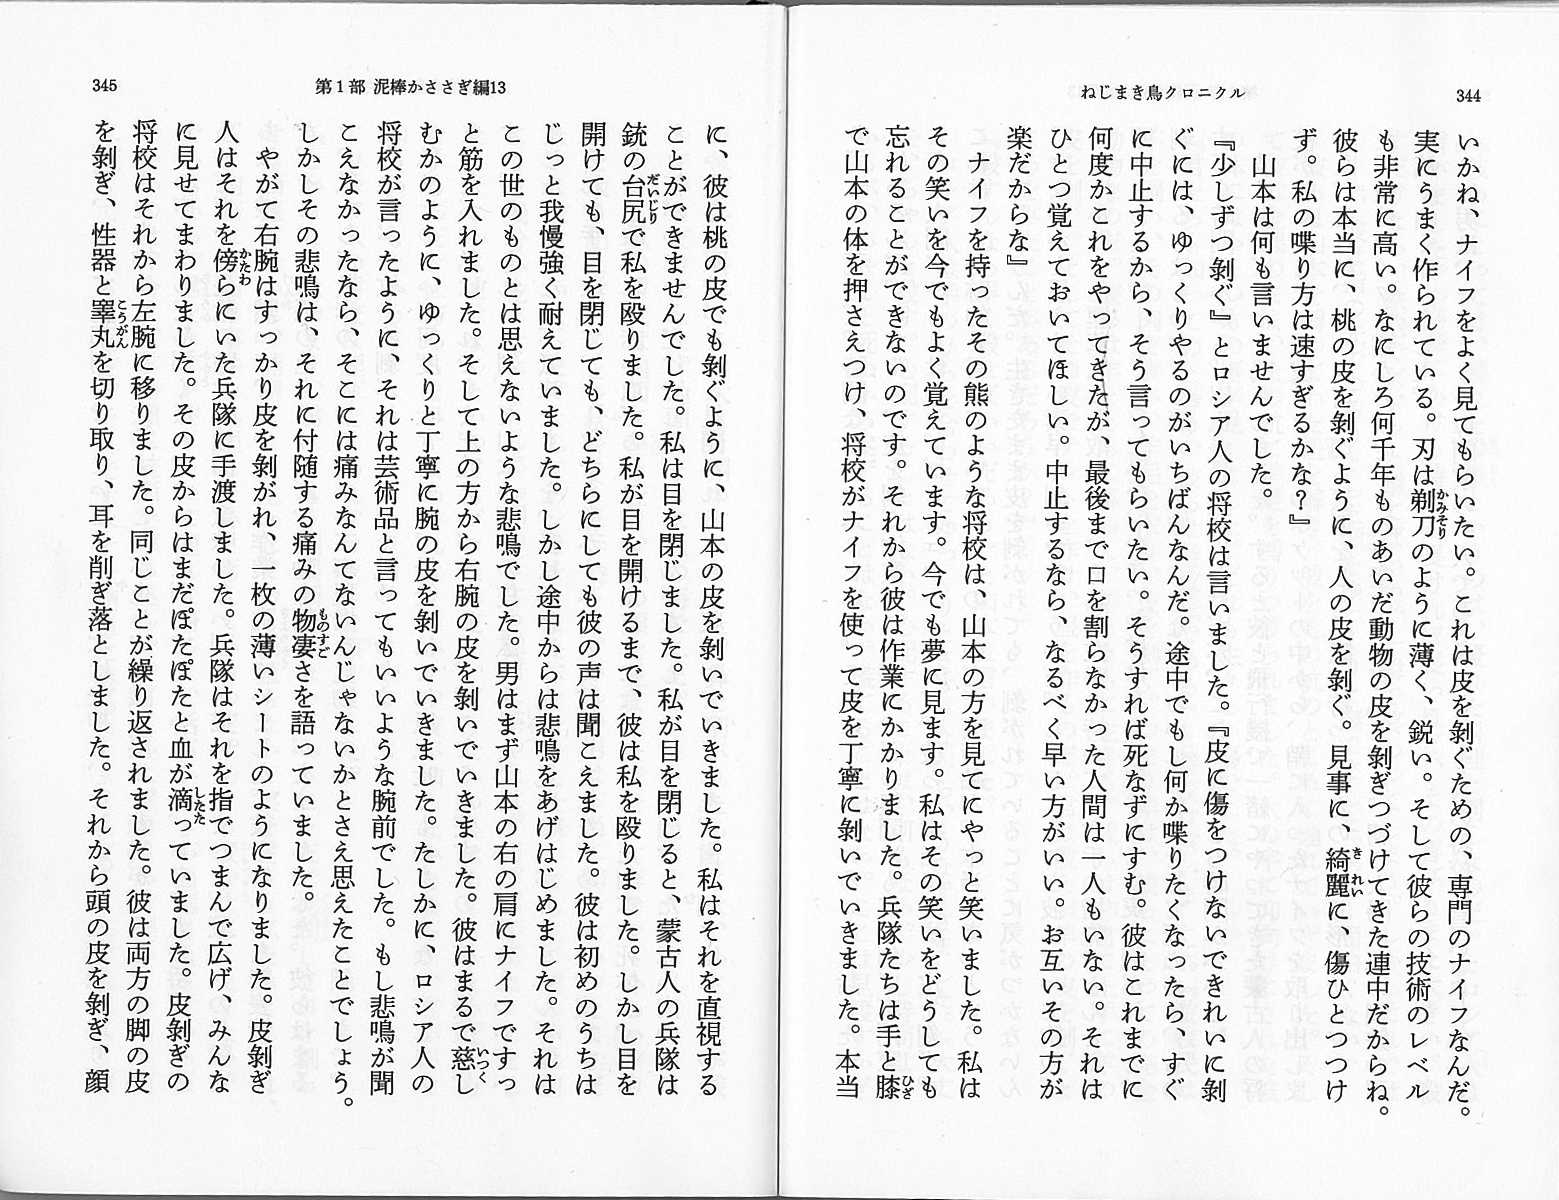 https://cs-sapporo.com/upload/image/4L_honbun_nejimakidori.jpg